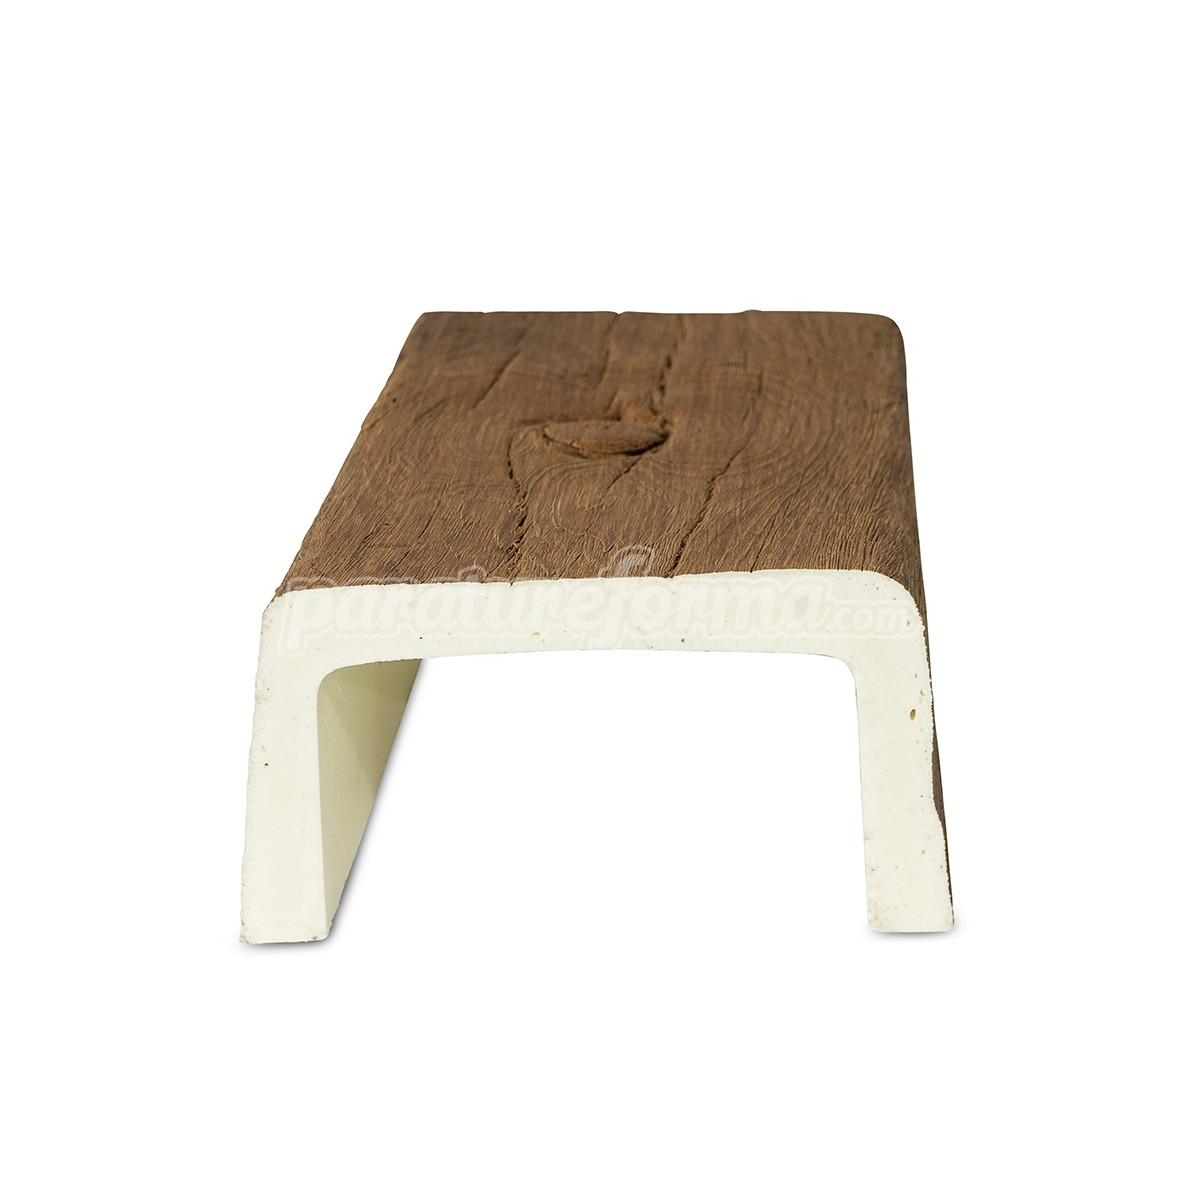 Viga imitación a madera 300x14,5x8 Grupo Unamacor